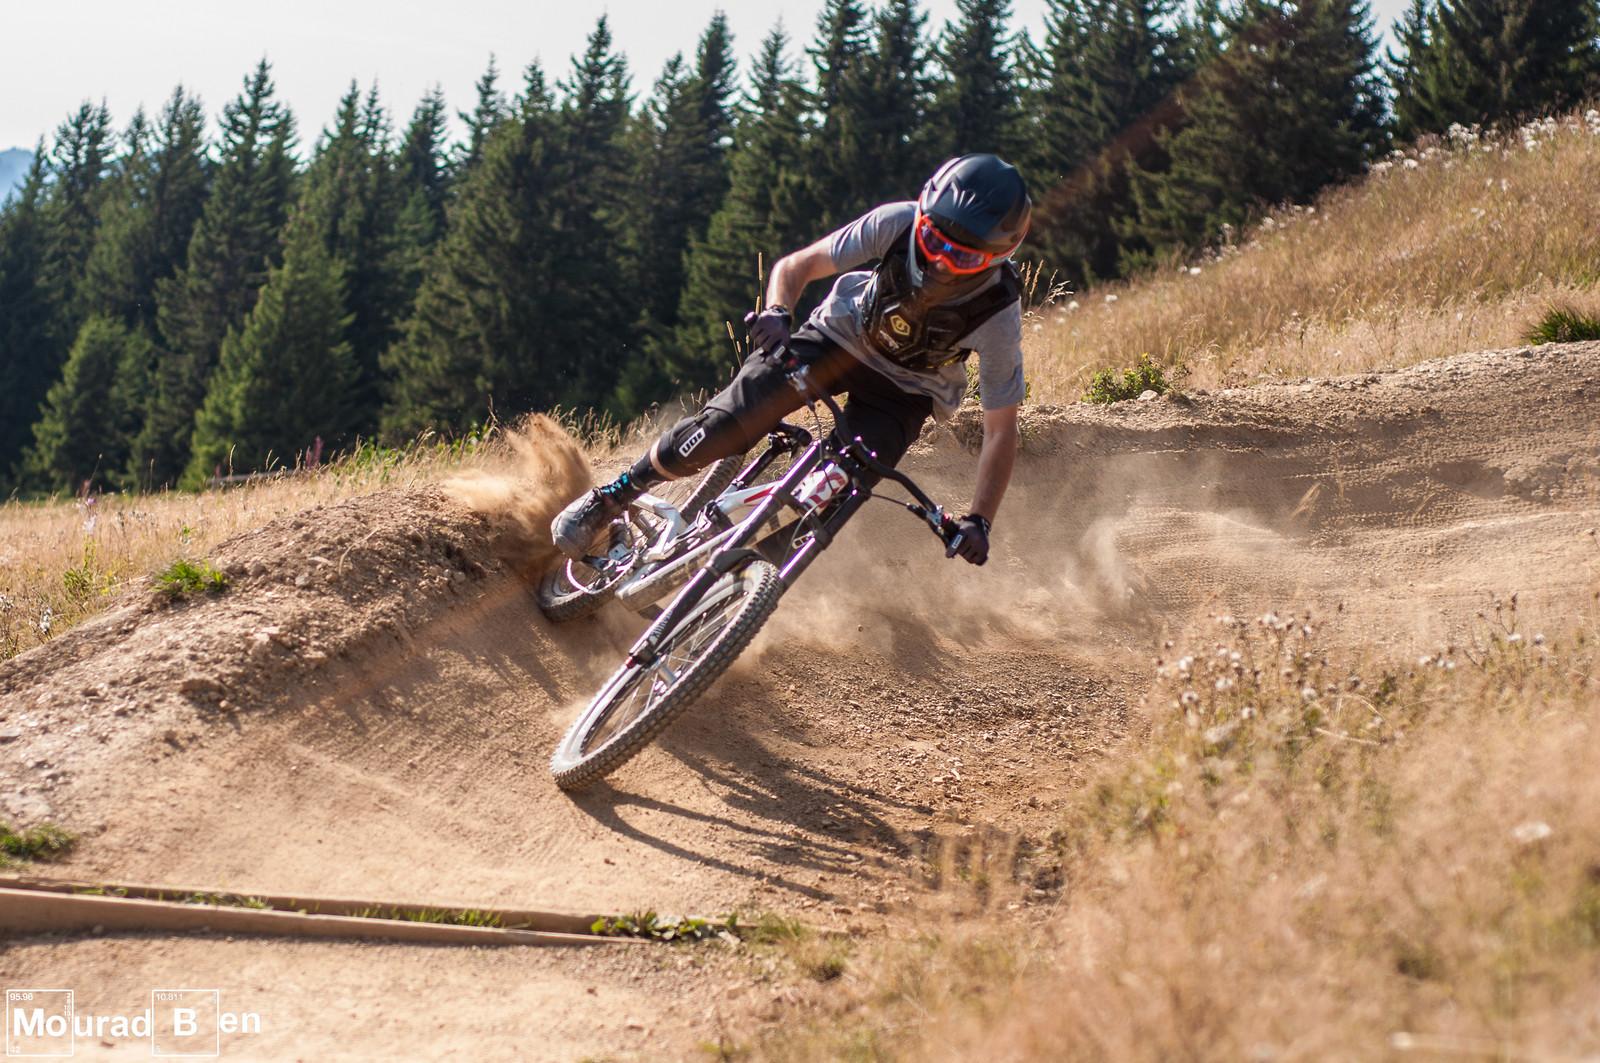 Drifting - Romuald_Manach - Mountain Biking Pictures - Vital MTB